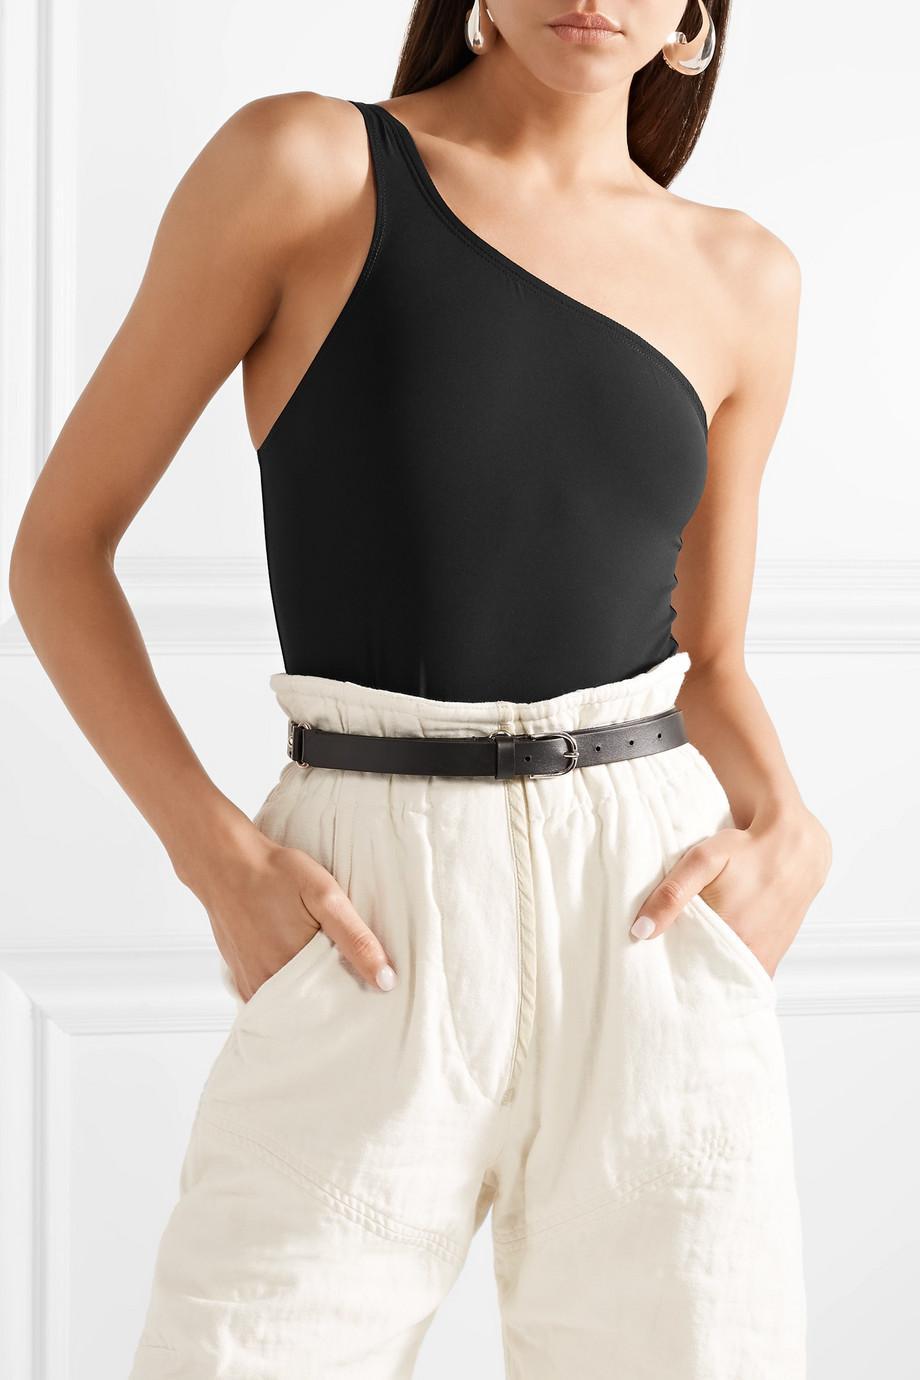 00fbc846a9 Isabel Marant One-shoulder Stretch-jersey Bodysuit in Black - Lyst